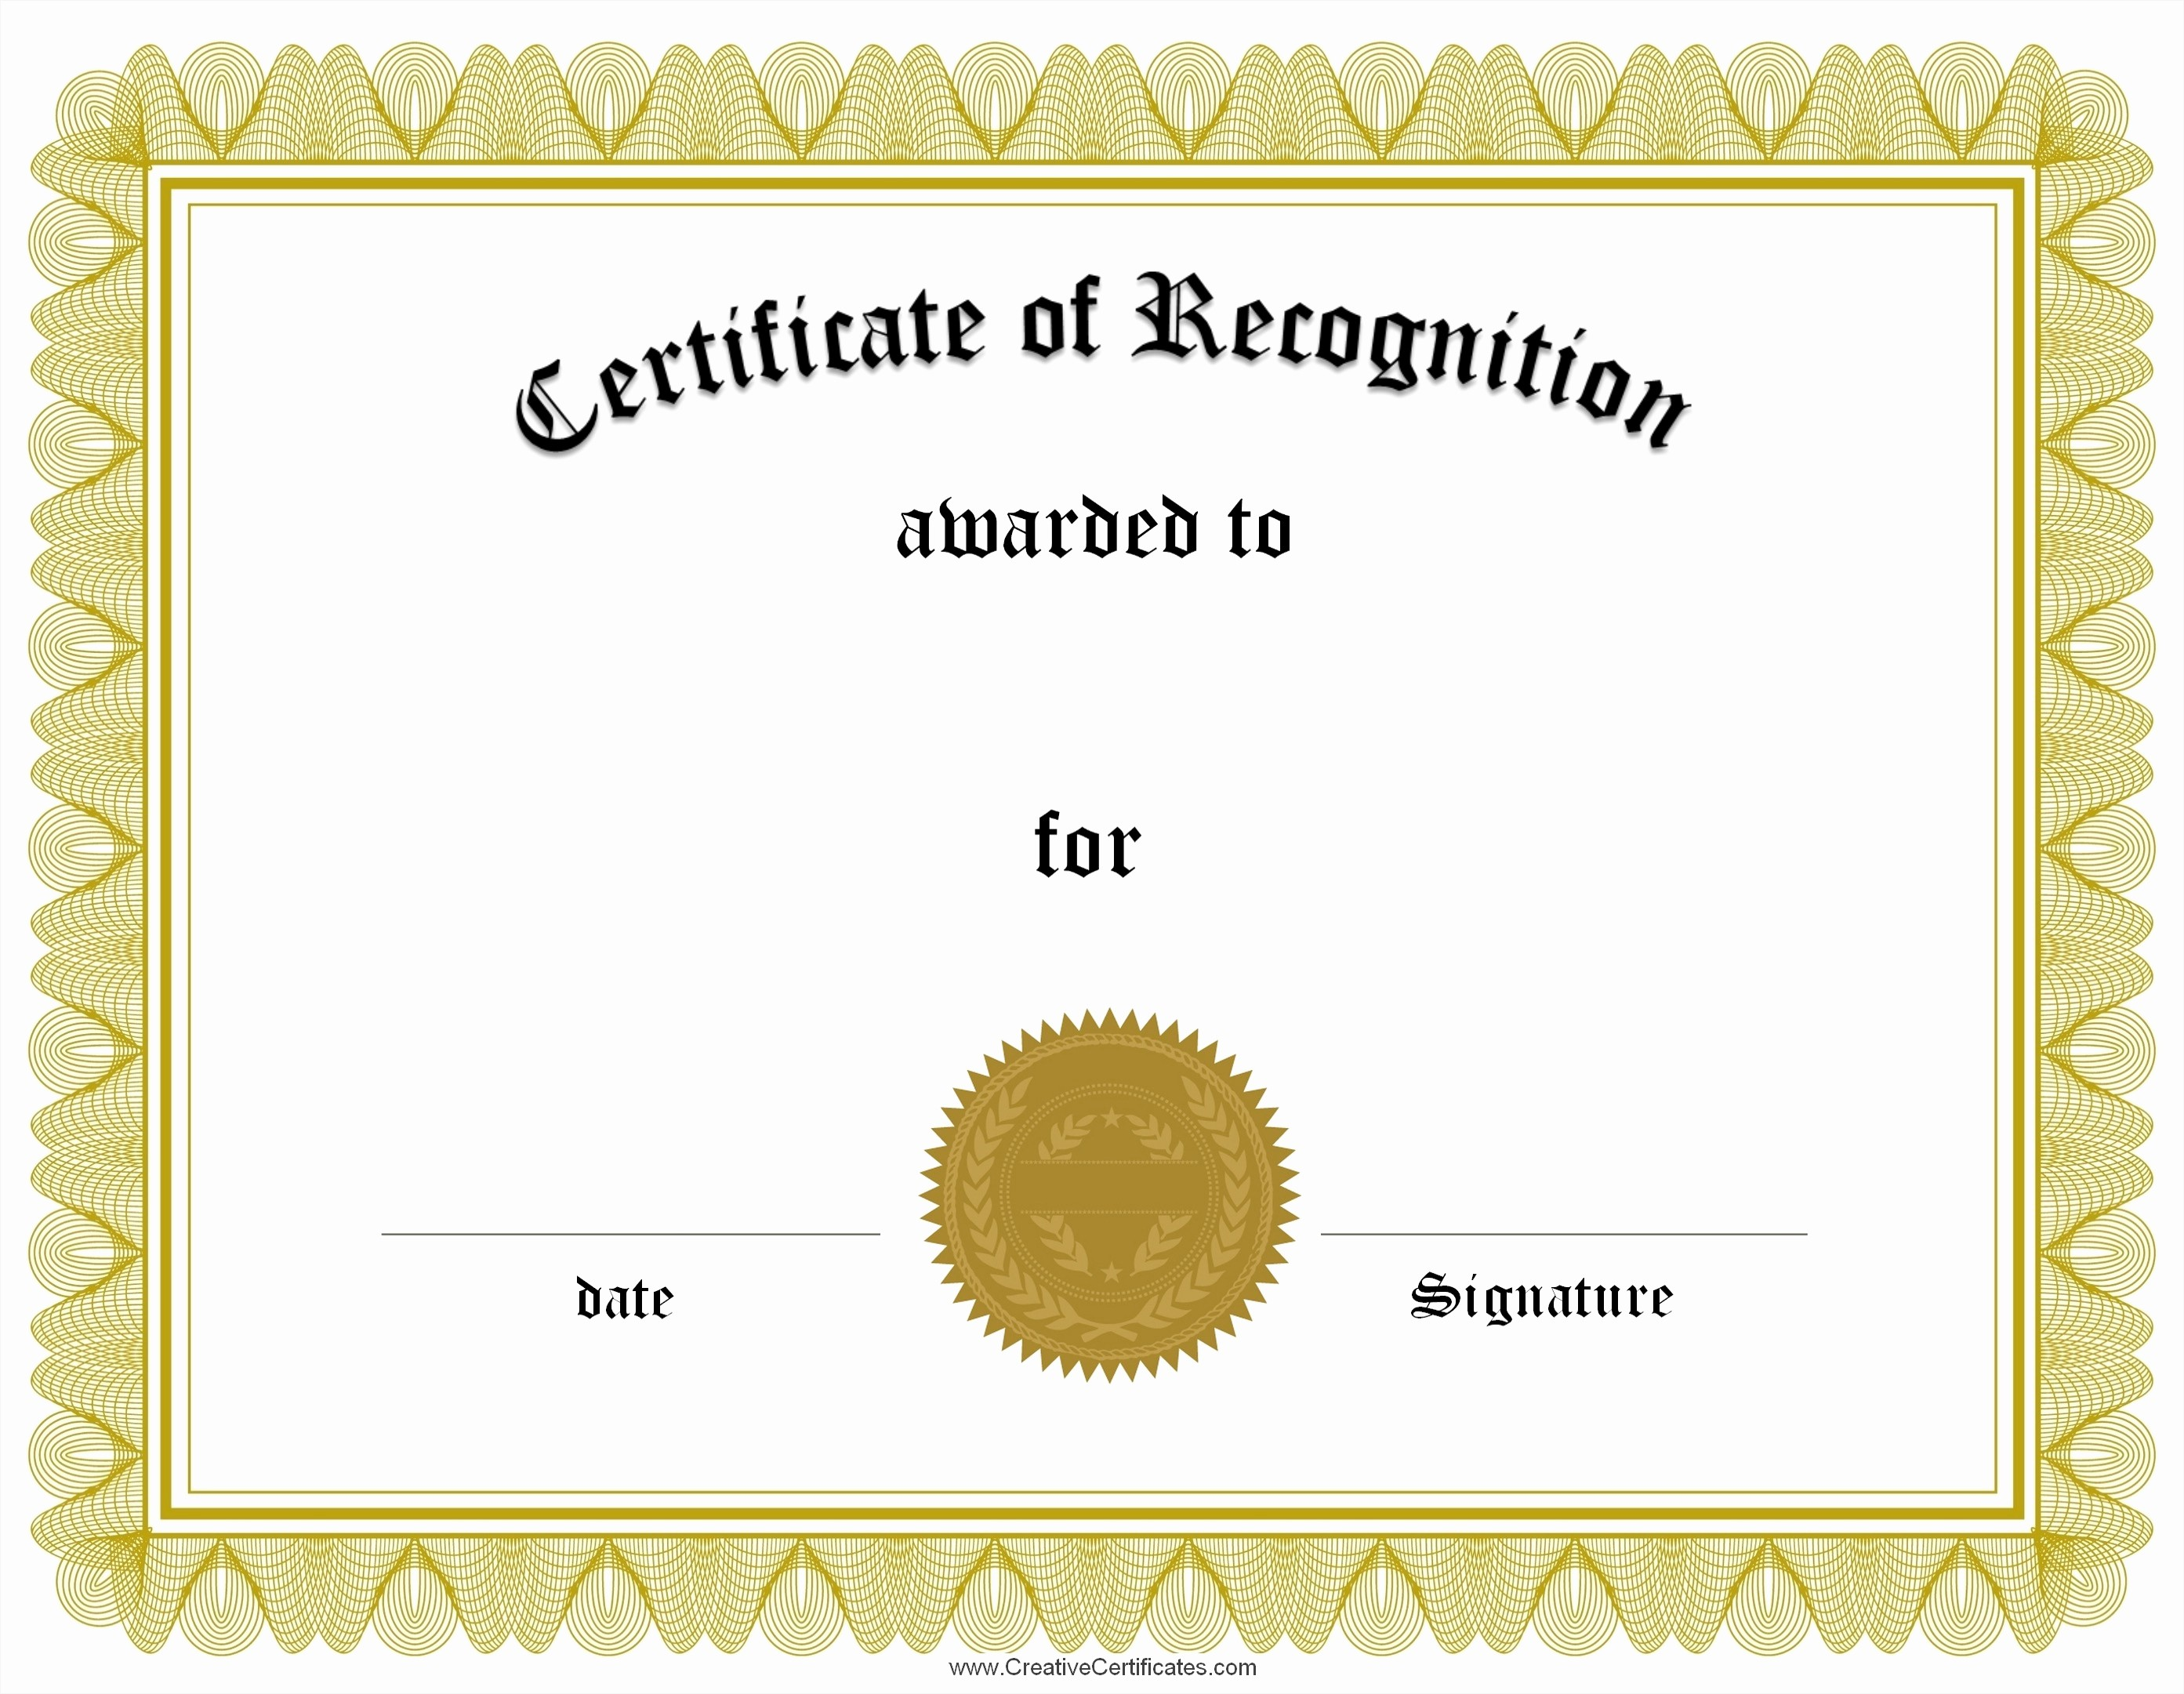 blank certificates of pletion